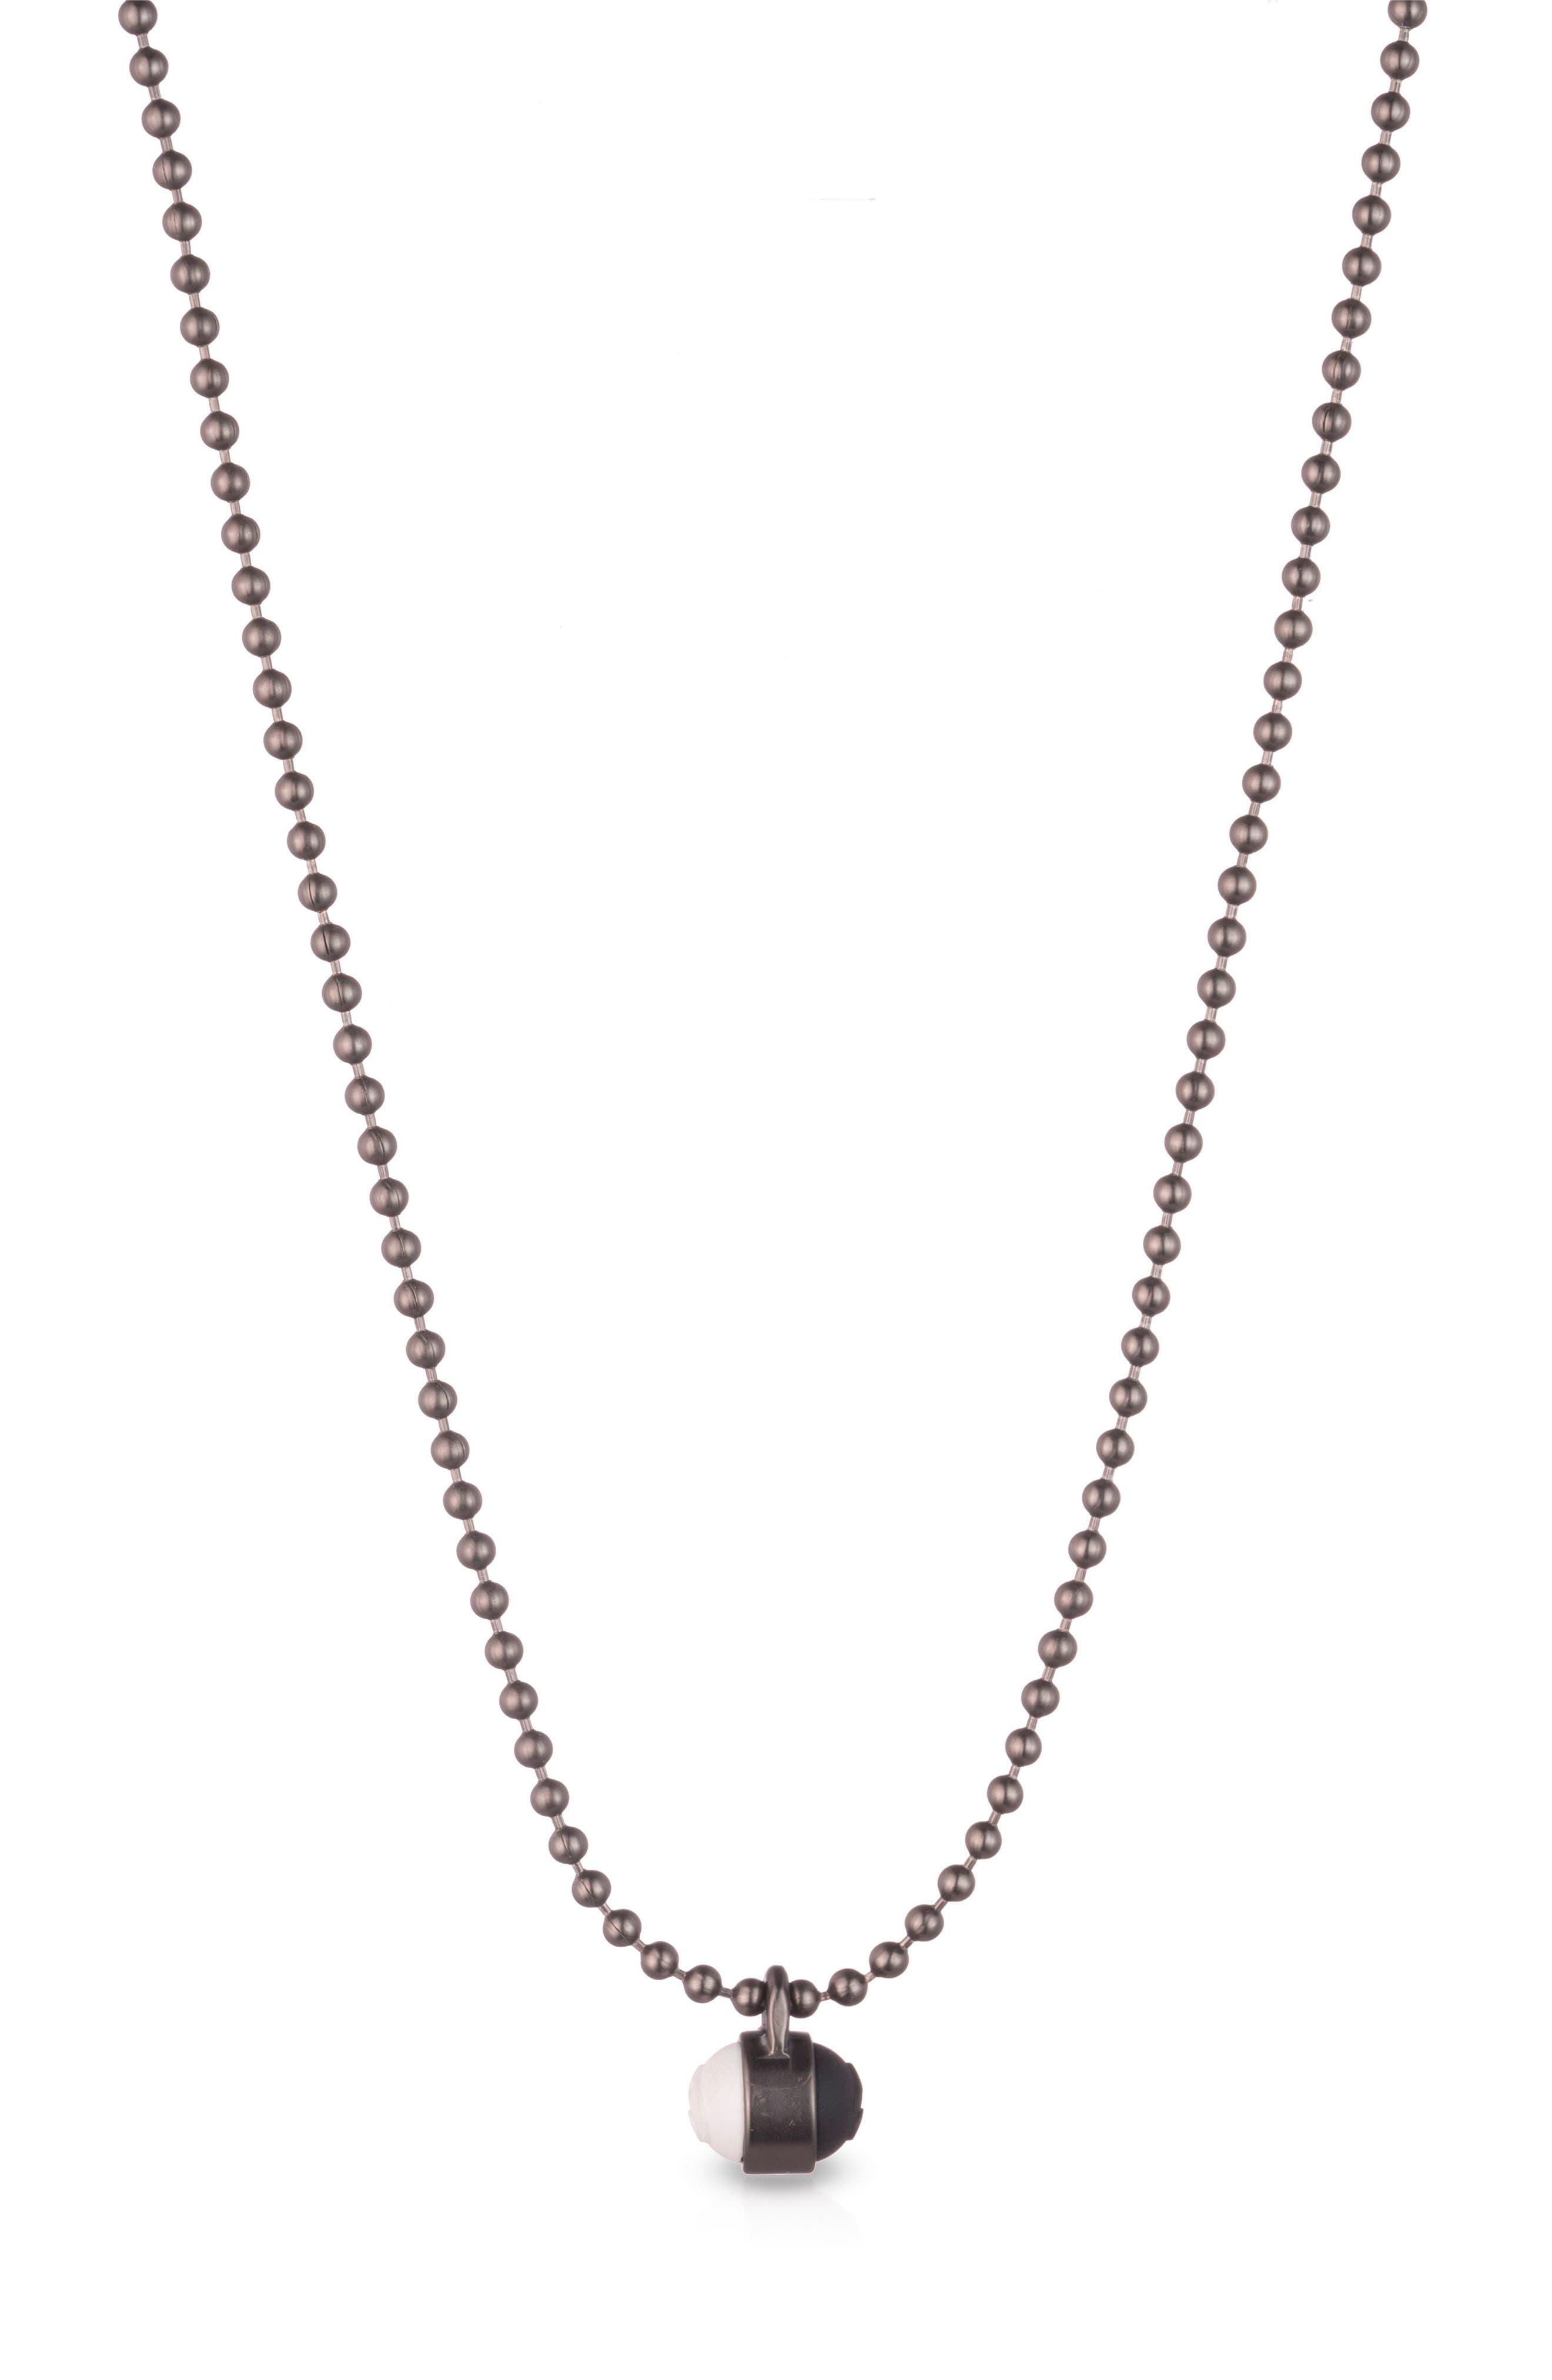 Lokai Pendant Ball Chain Necklace